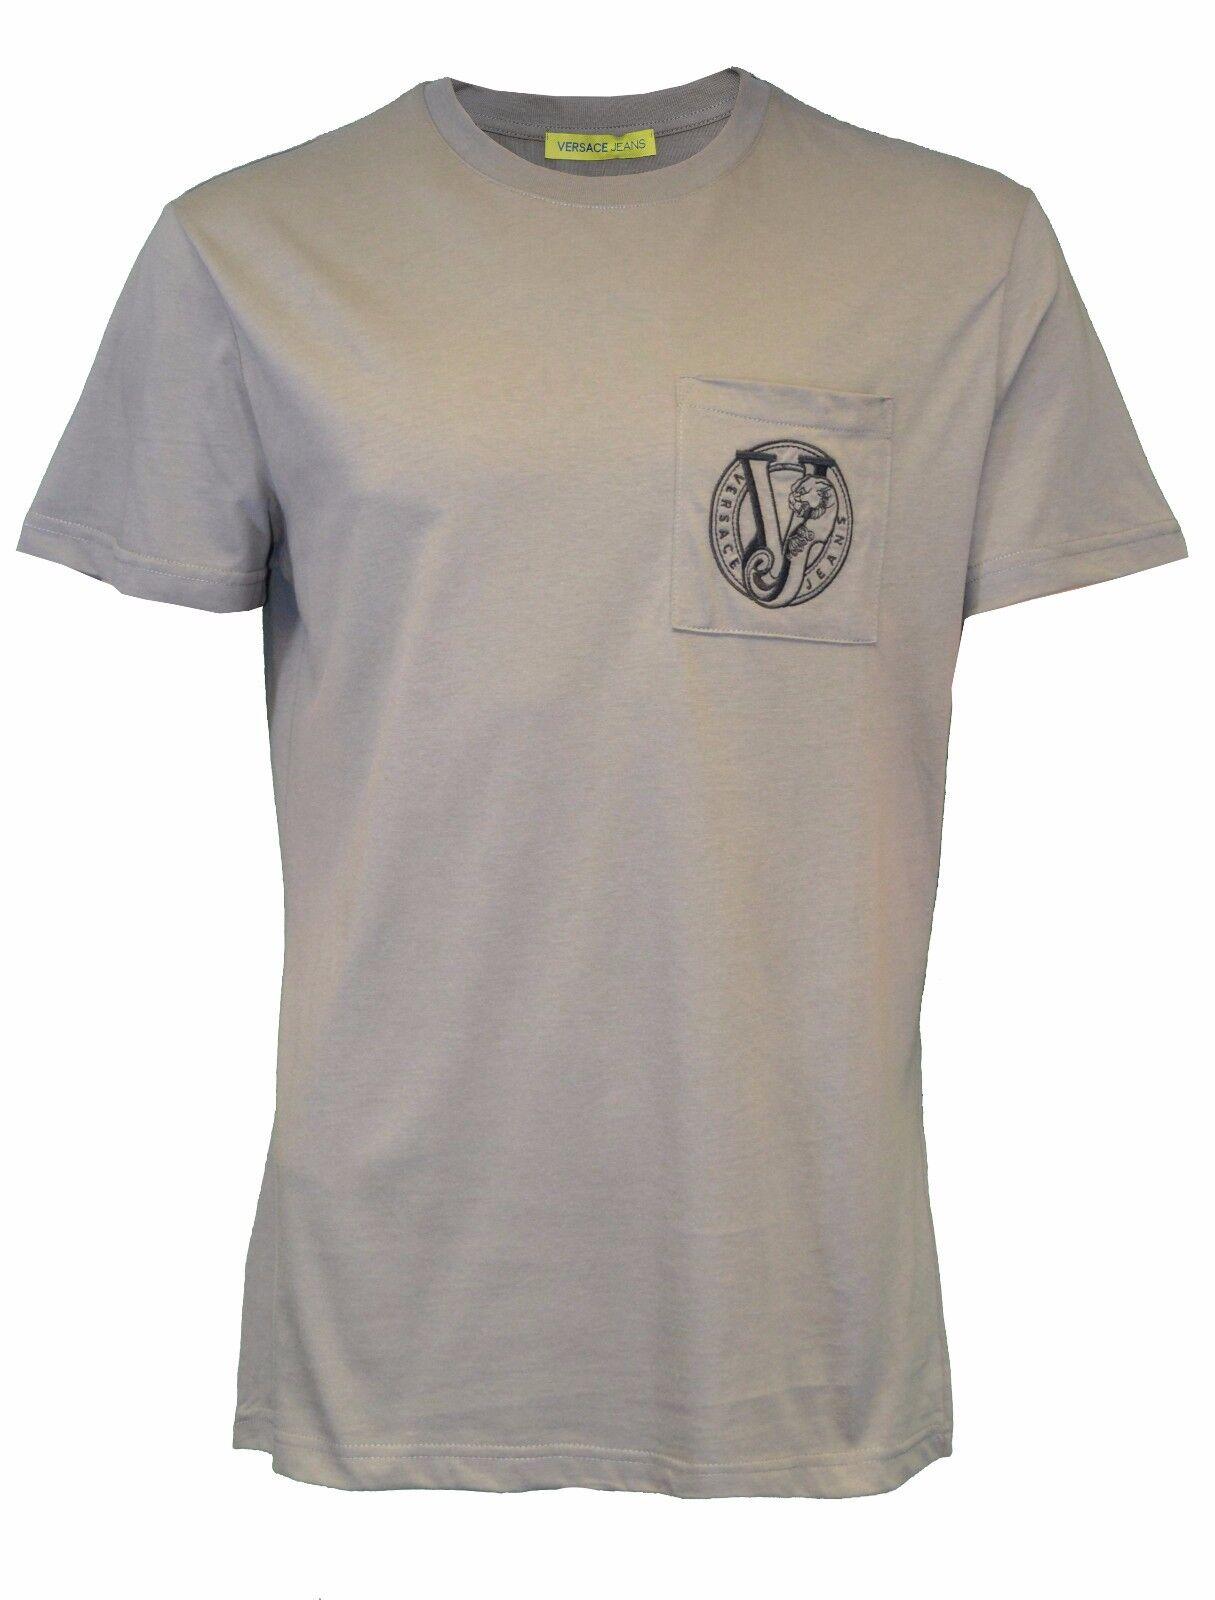 BNWT Versace Jeans grigio TIGER VJ logo ricamato sulla tasca T-SHIRT MAGLIETTA RARA